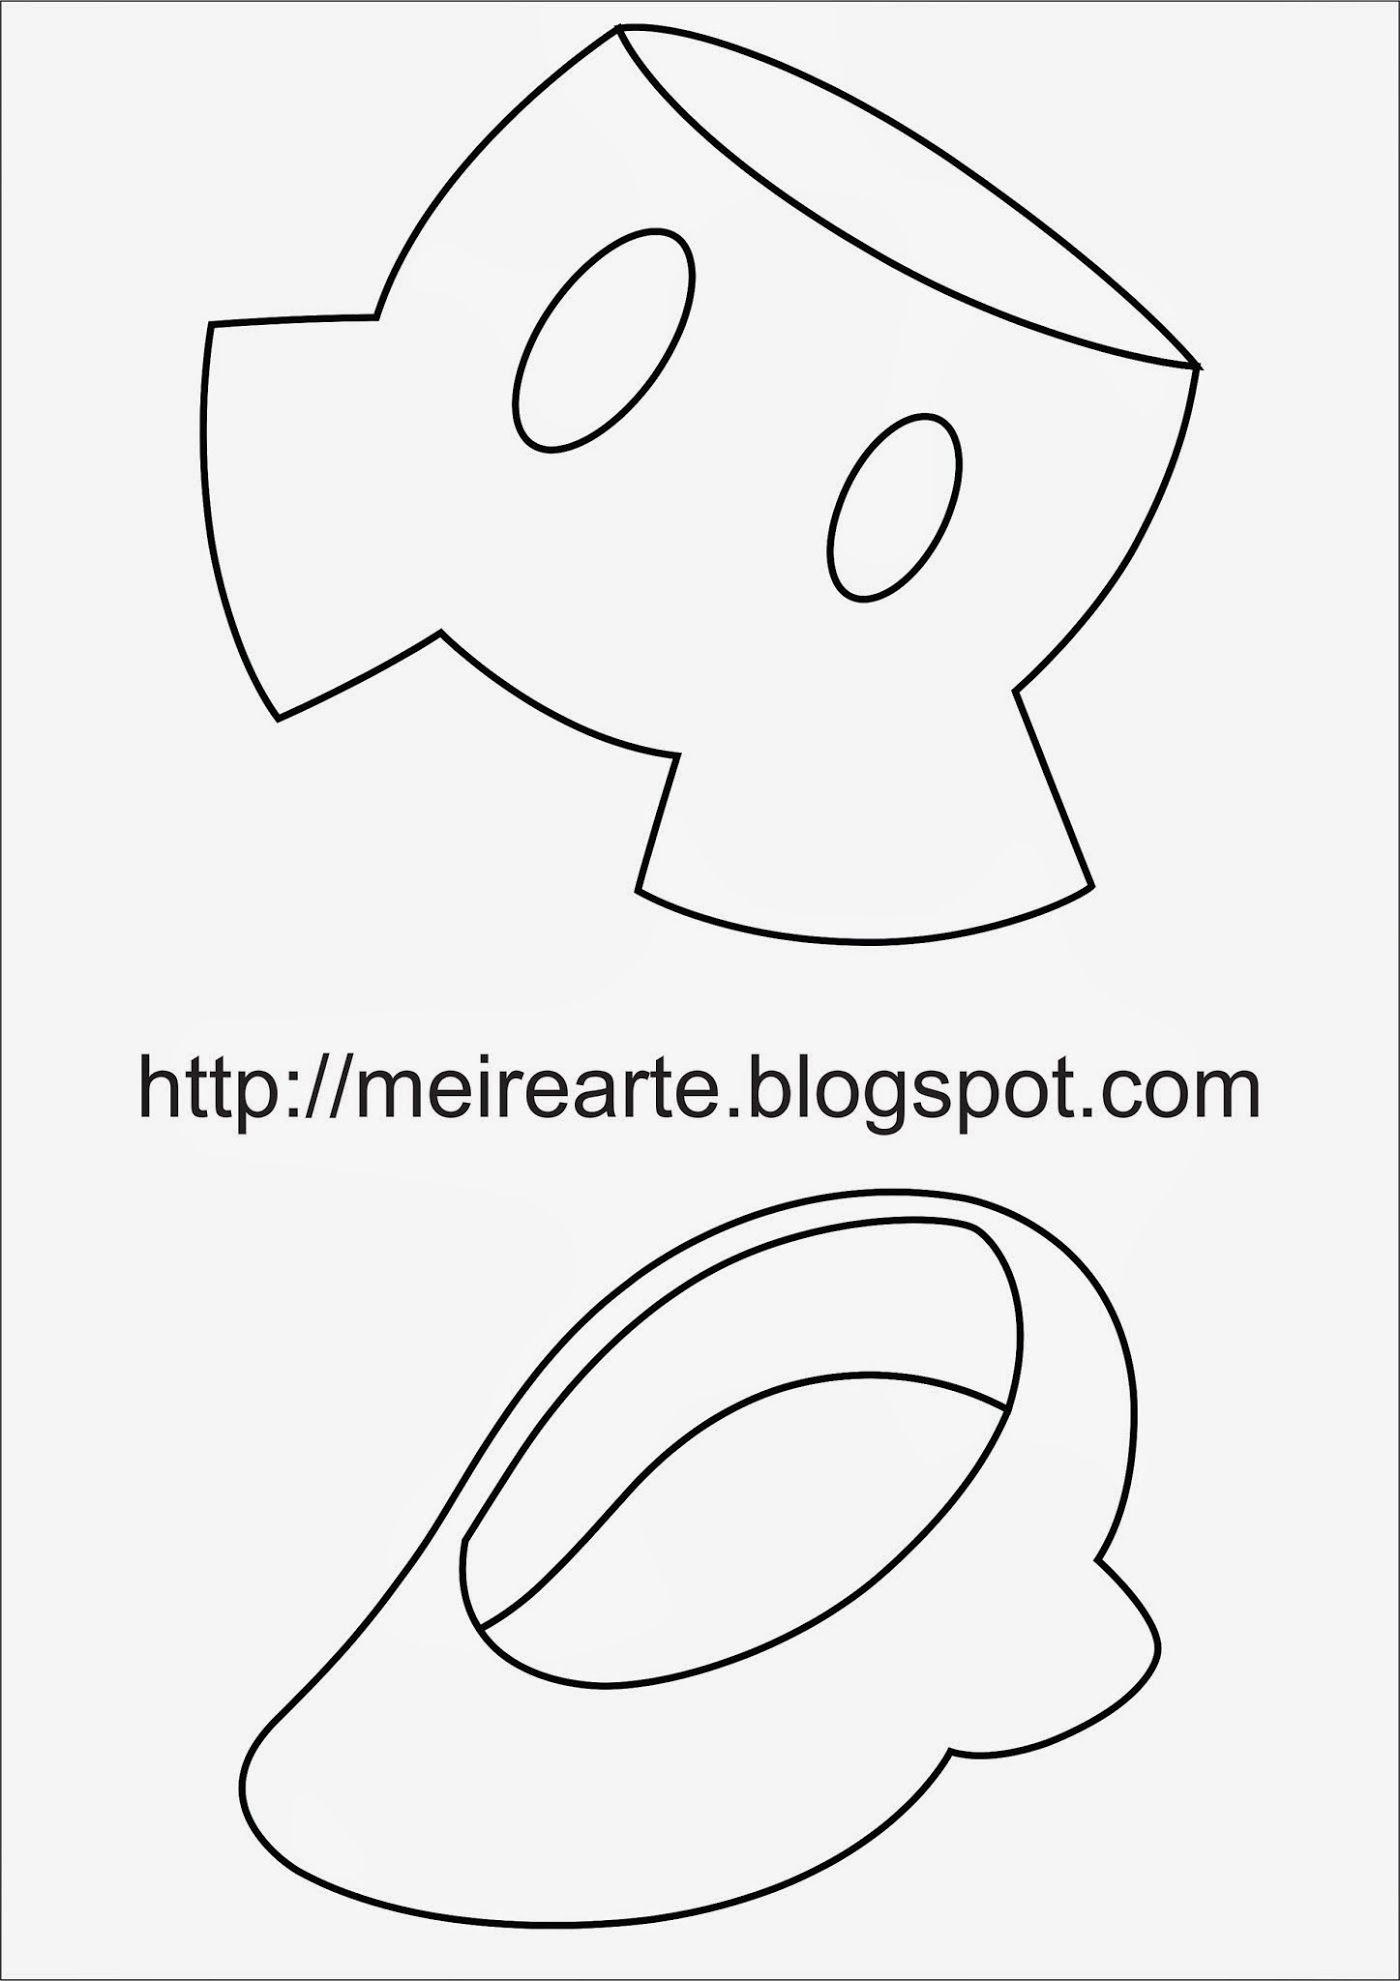 Imagem | My stuff | Pinterest | Color copies, Punch art and Mice